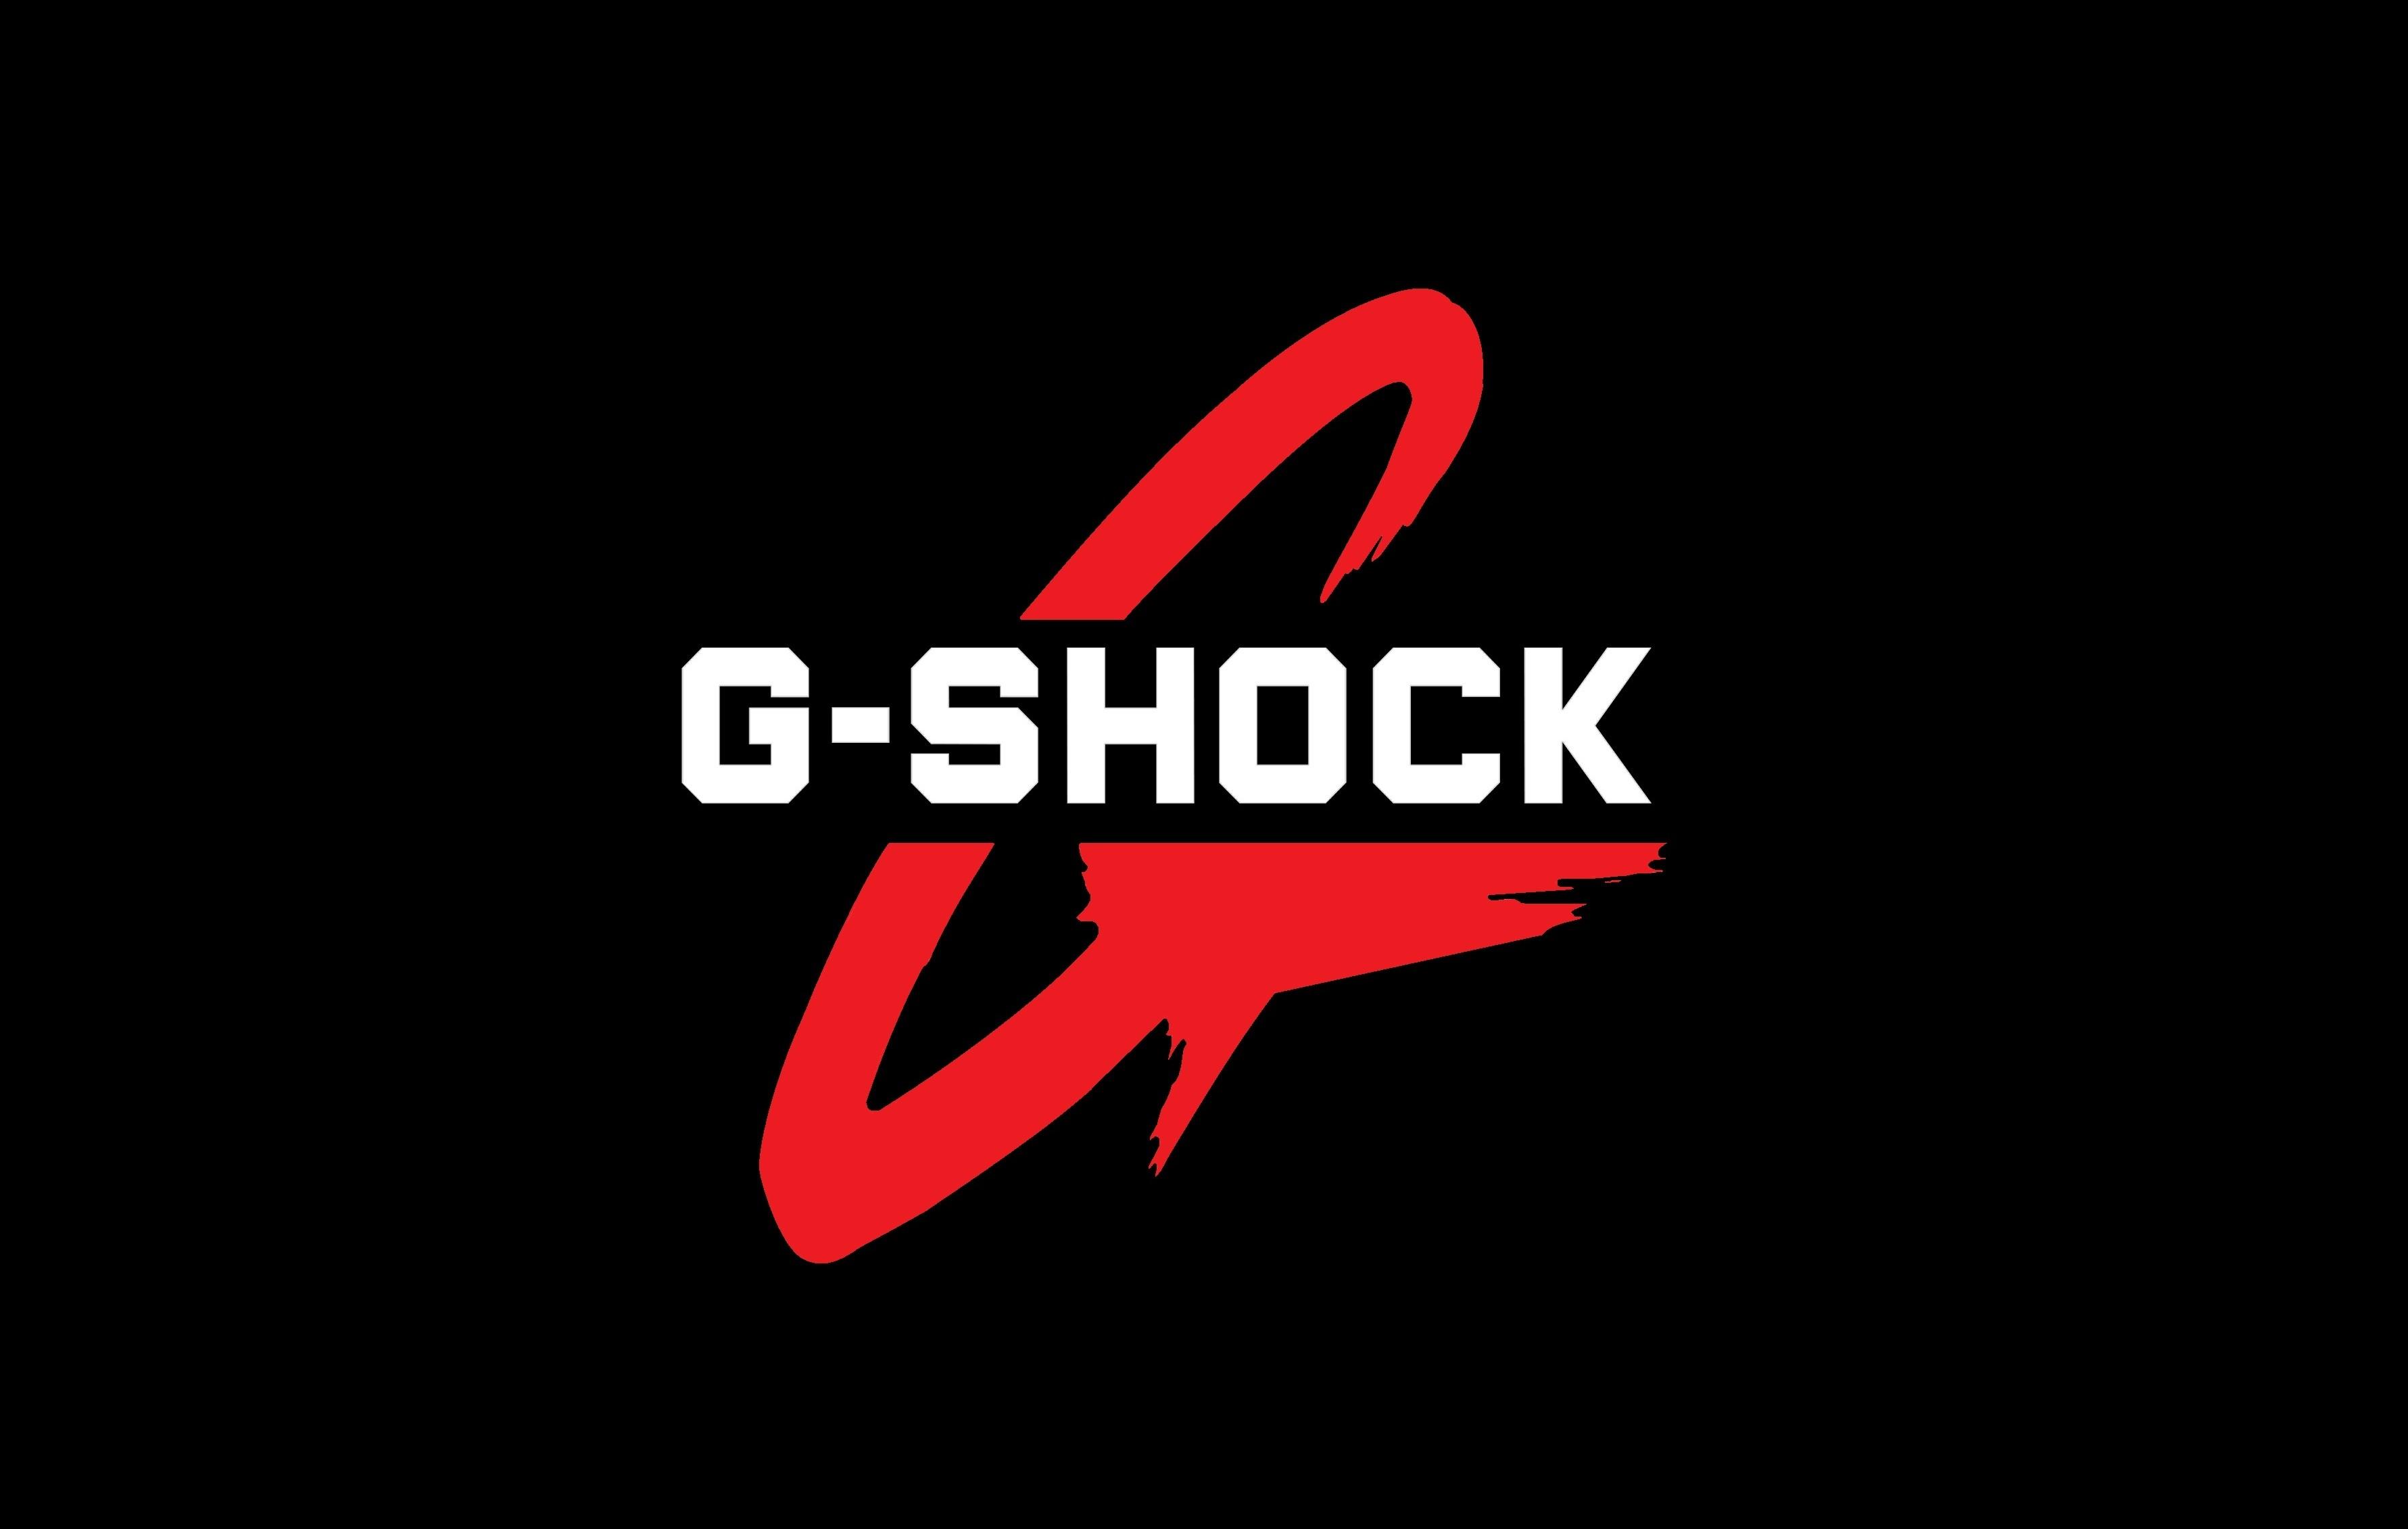 Casio G-Shock Logo Brand Wallpaper